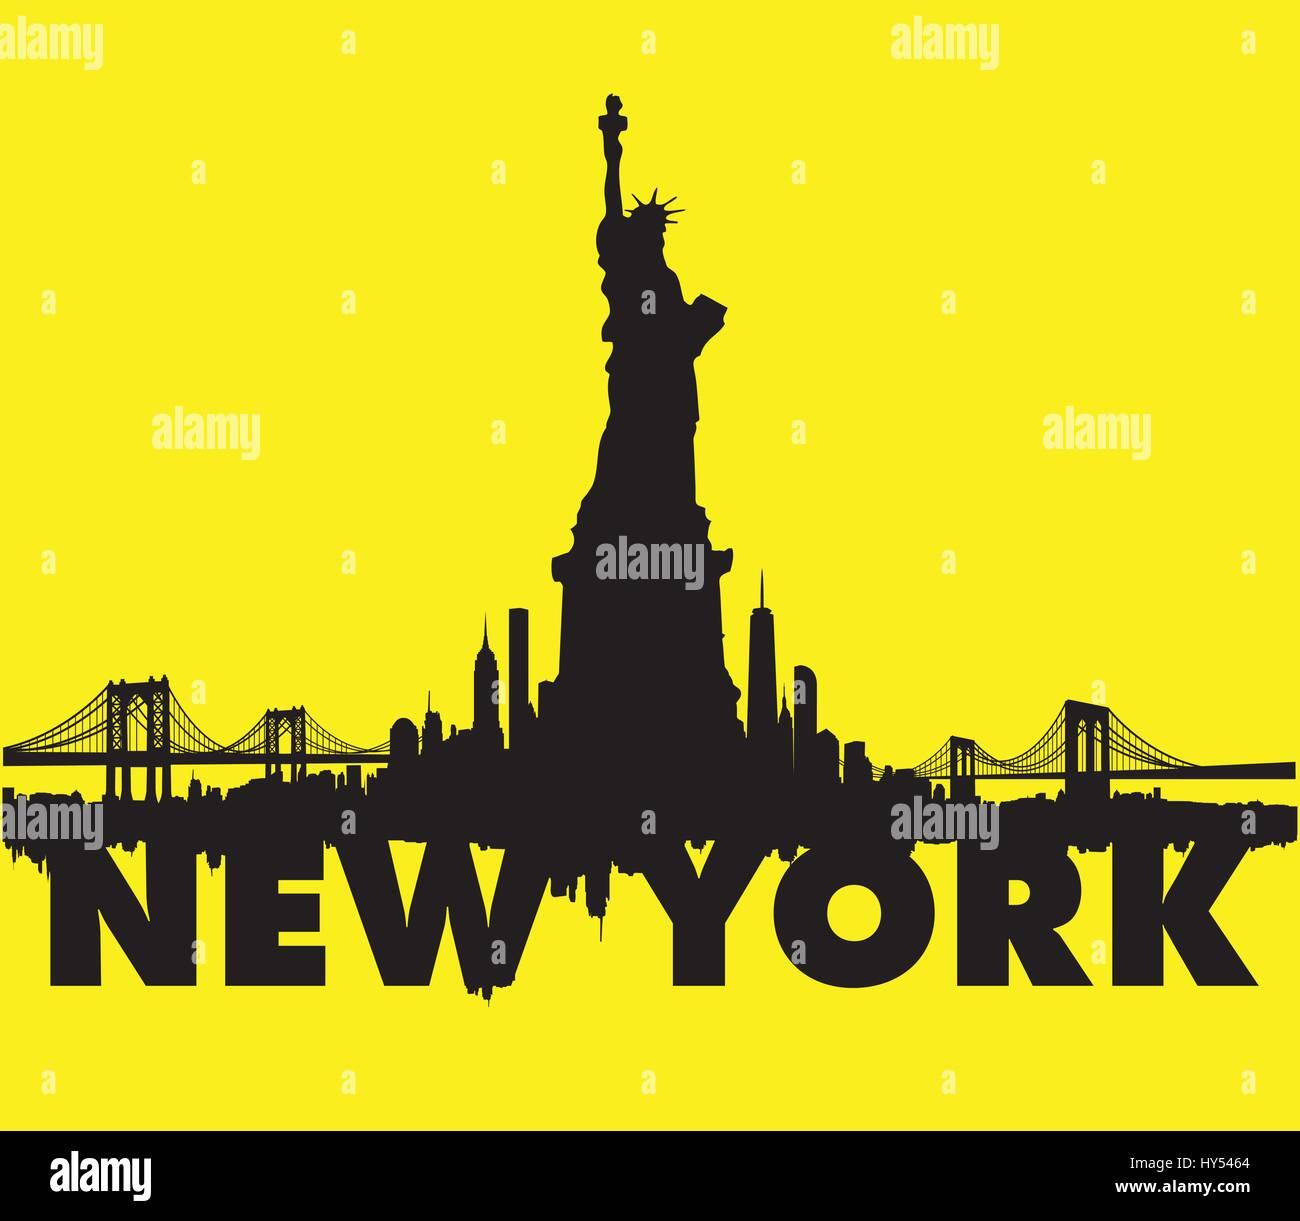 New York City Skyline with Statue of Liberty Vectors series - Stock Vector